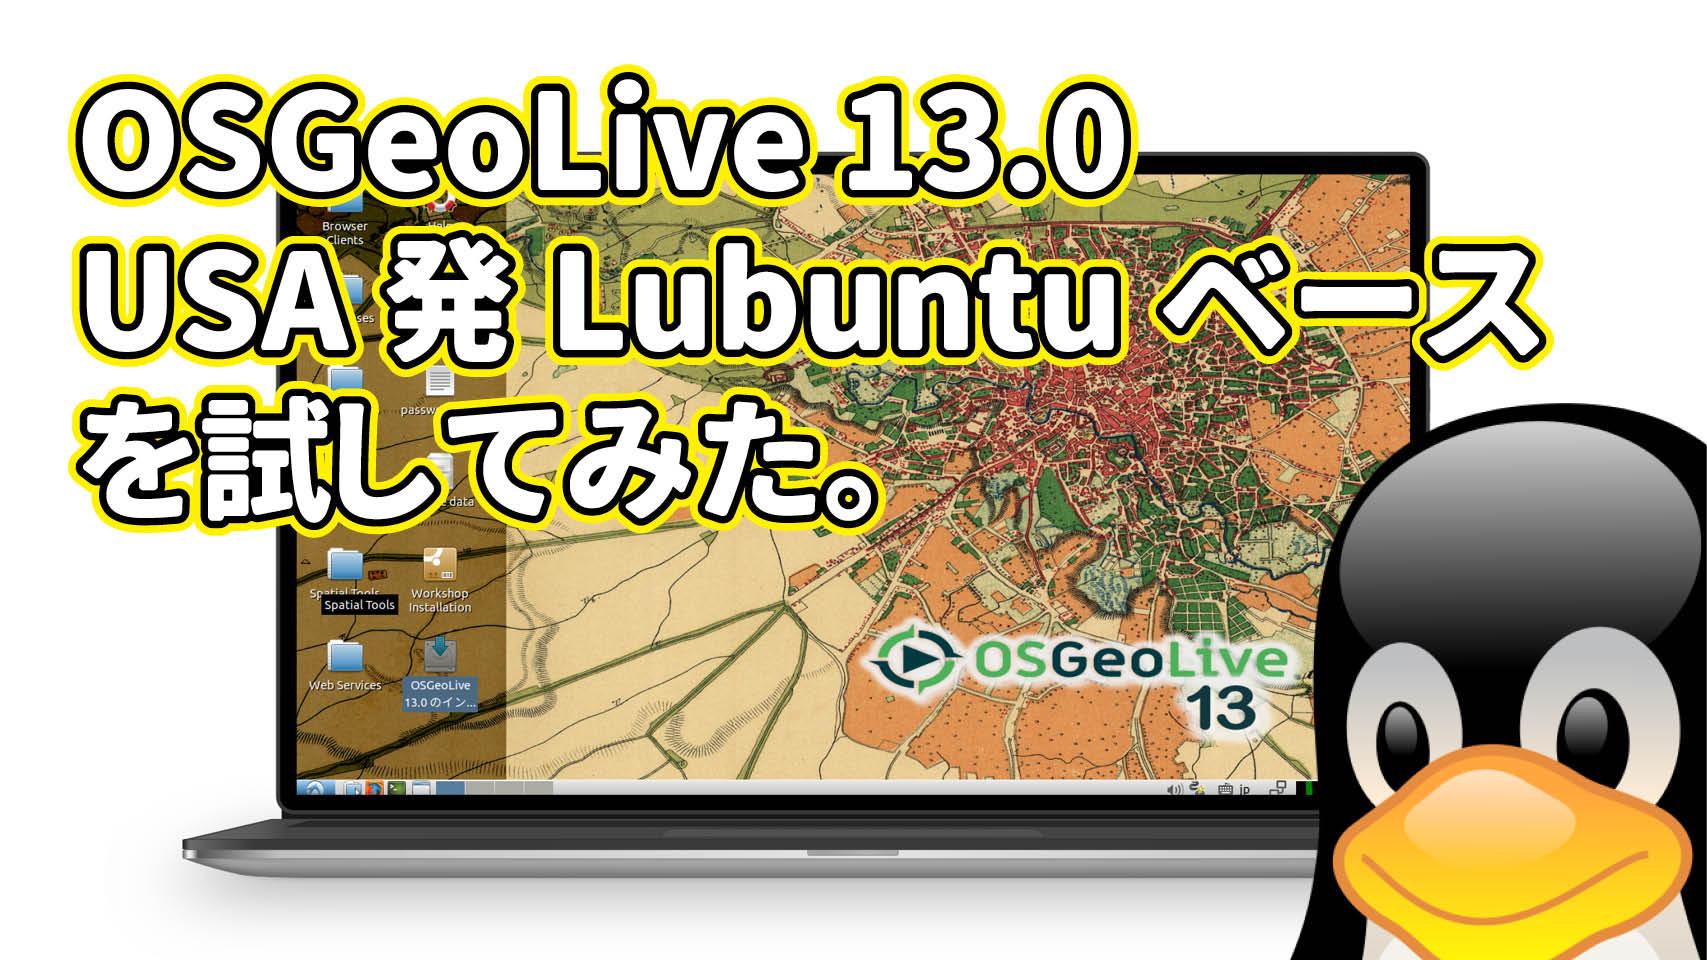 OSGeoLive 13.0: USA発LubuntuベースのLinuxがリリースされたので試してみた。